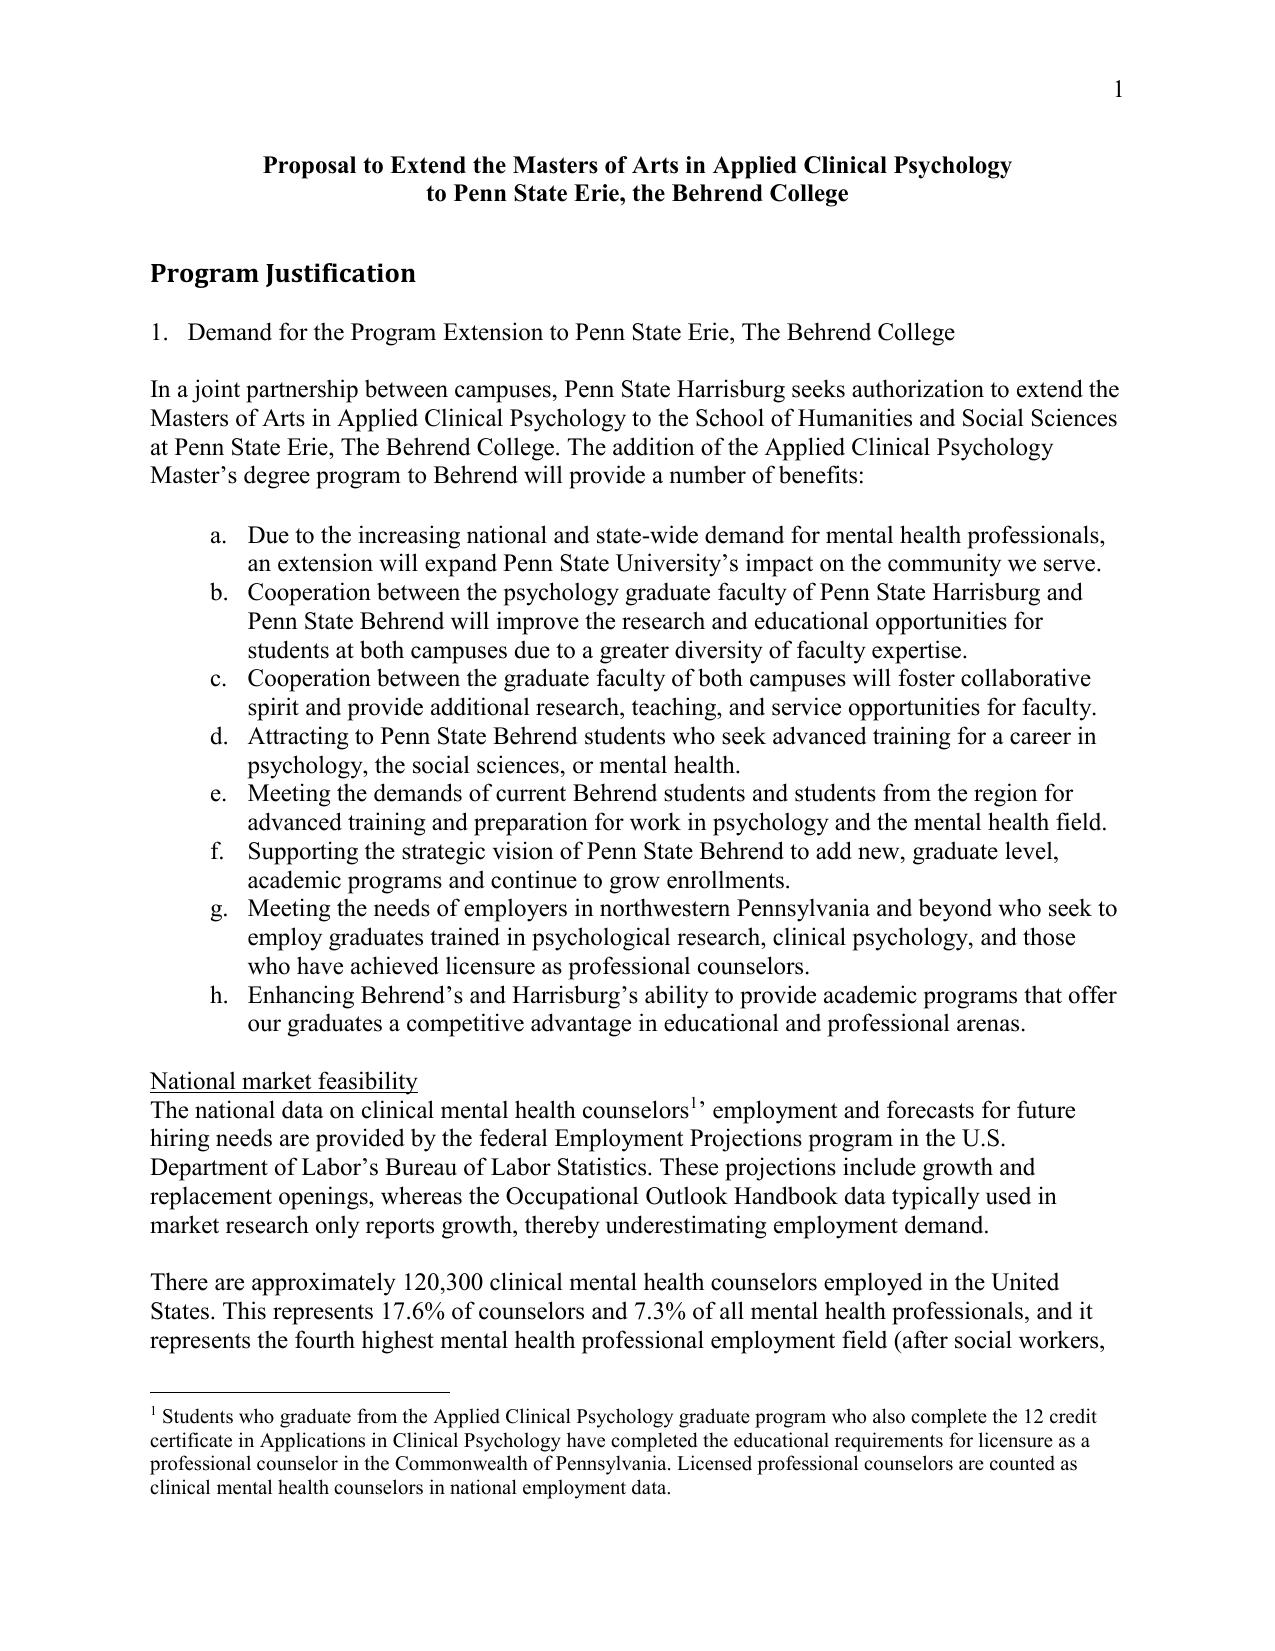 Program justification penn state behrend 1betcityfo Choice Image